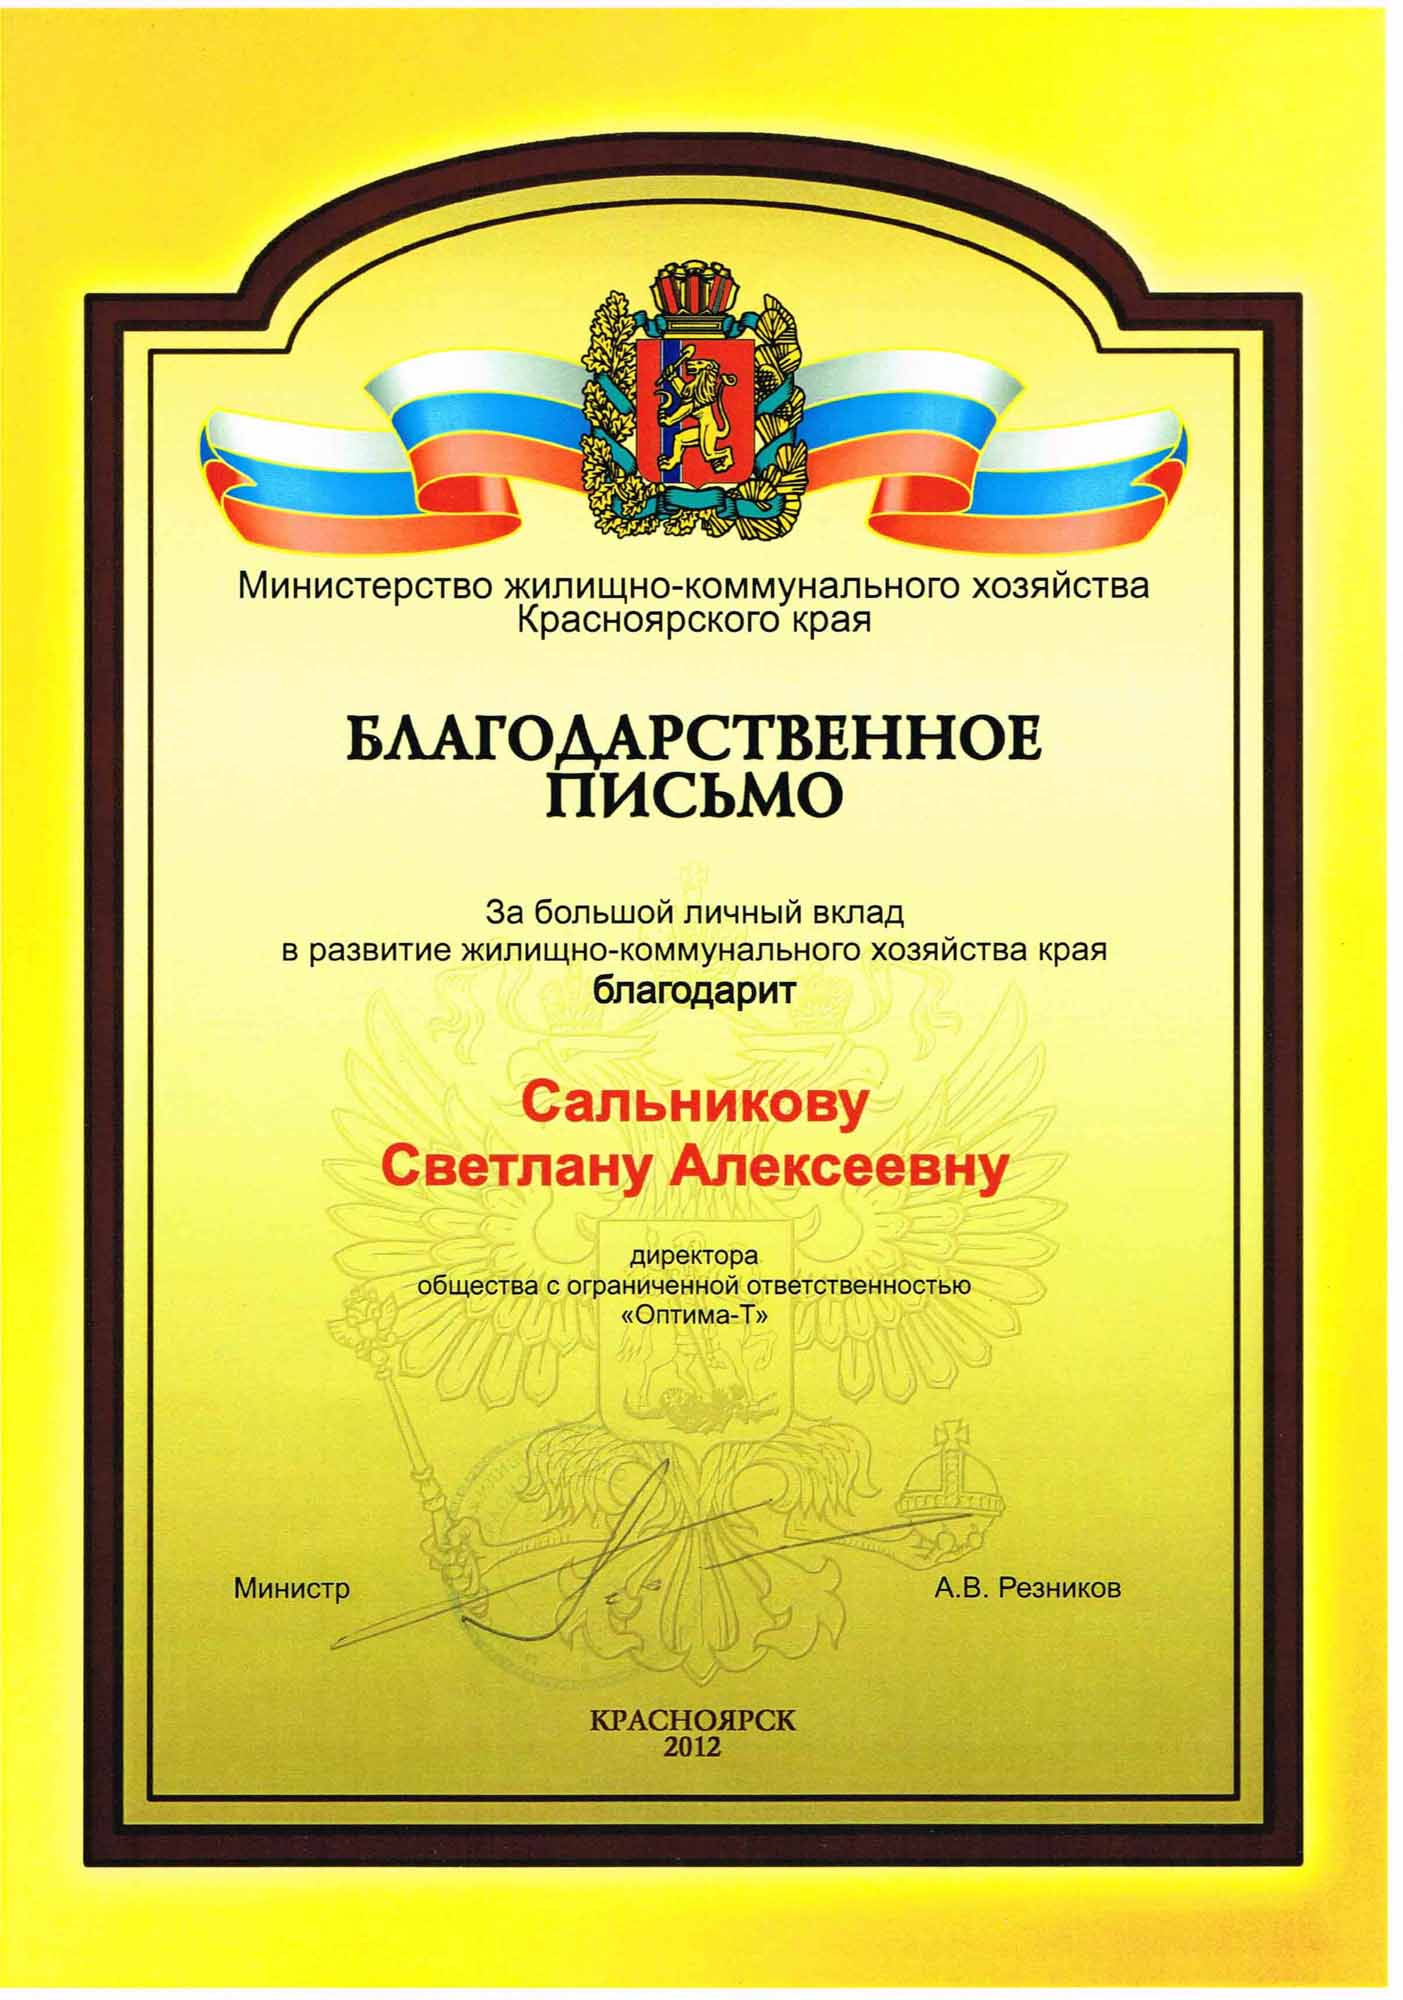 Министерство ЖКХ Красноярского края